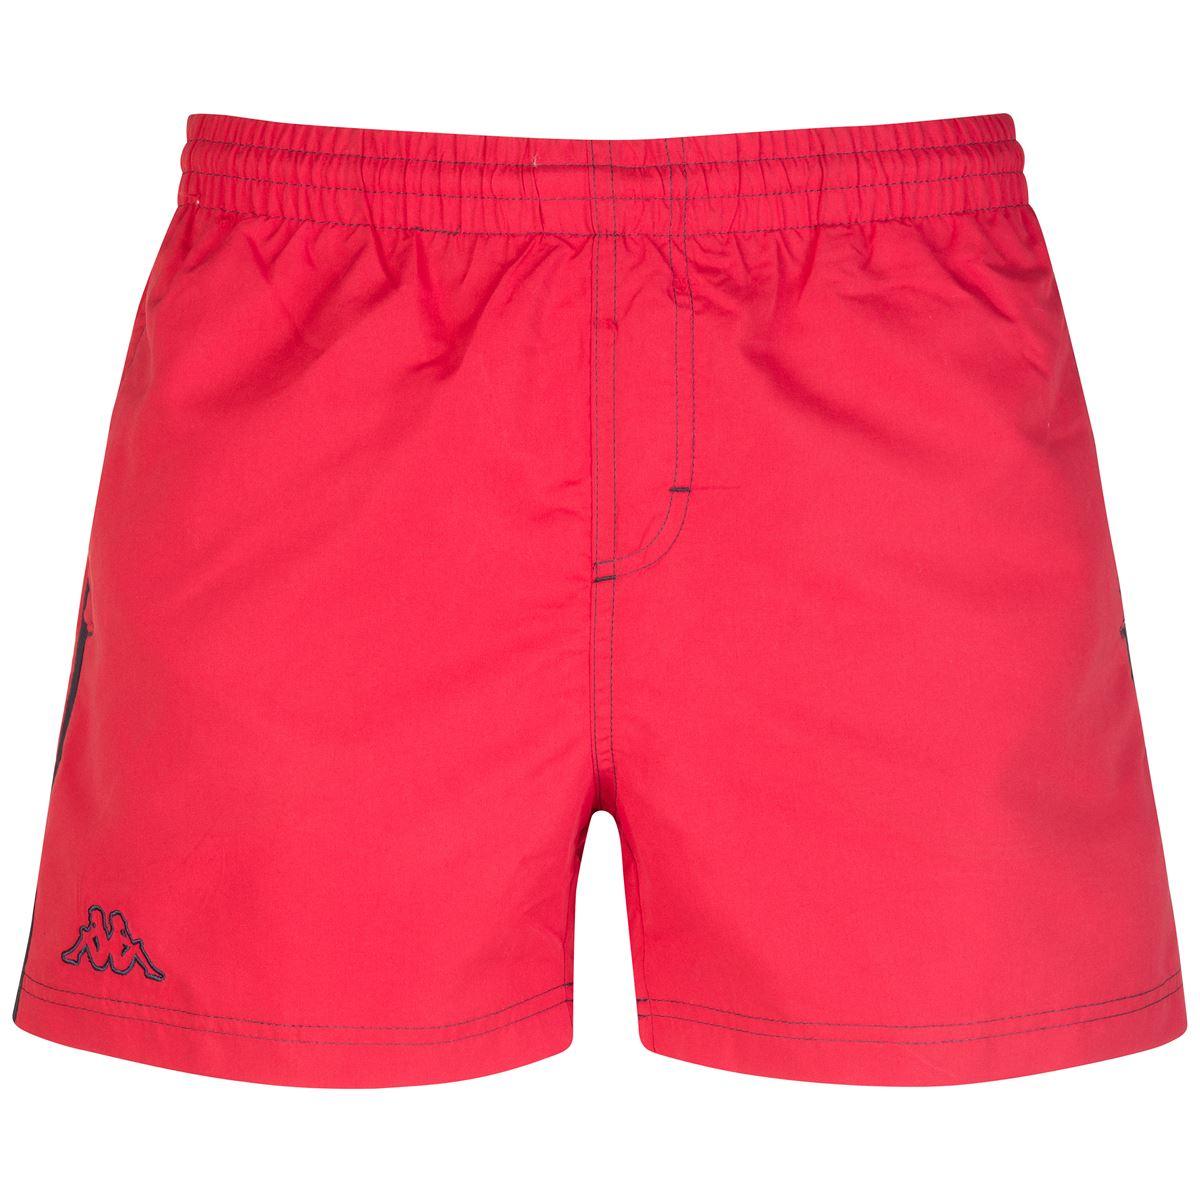 Kappa-Costume-mare-piscina-Uomo-LOGO-ZOLPIPY-Nuoto-sport-Boxer-pantaloncini